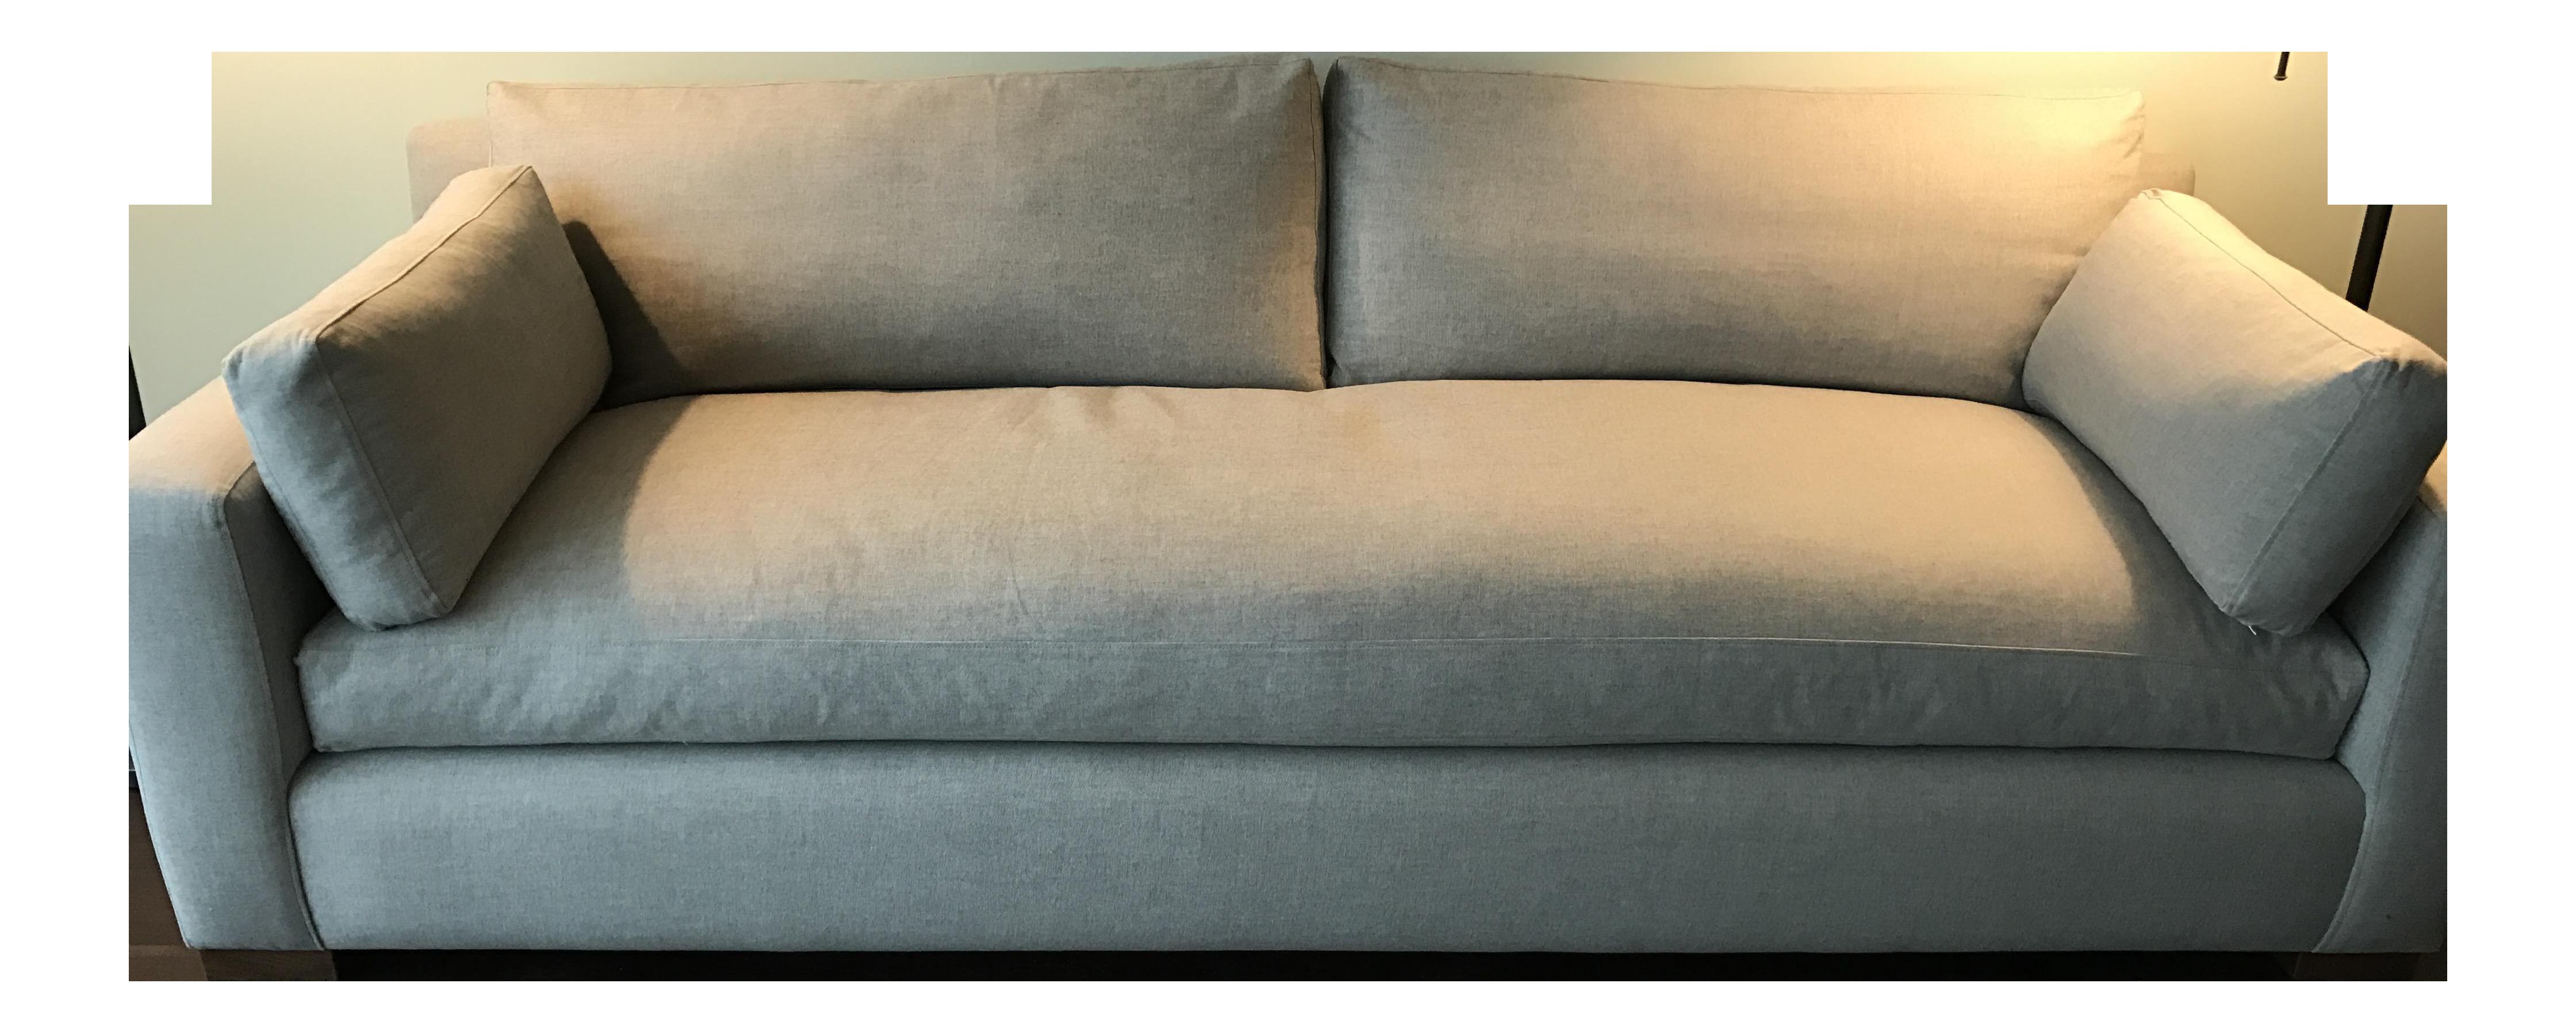 Montauk sofa stanley for Vente sofa montreal